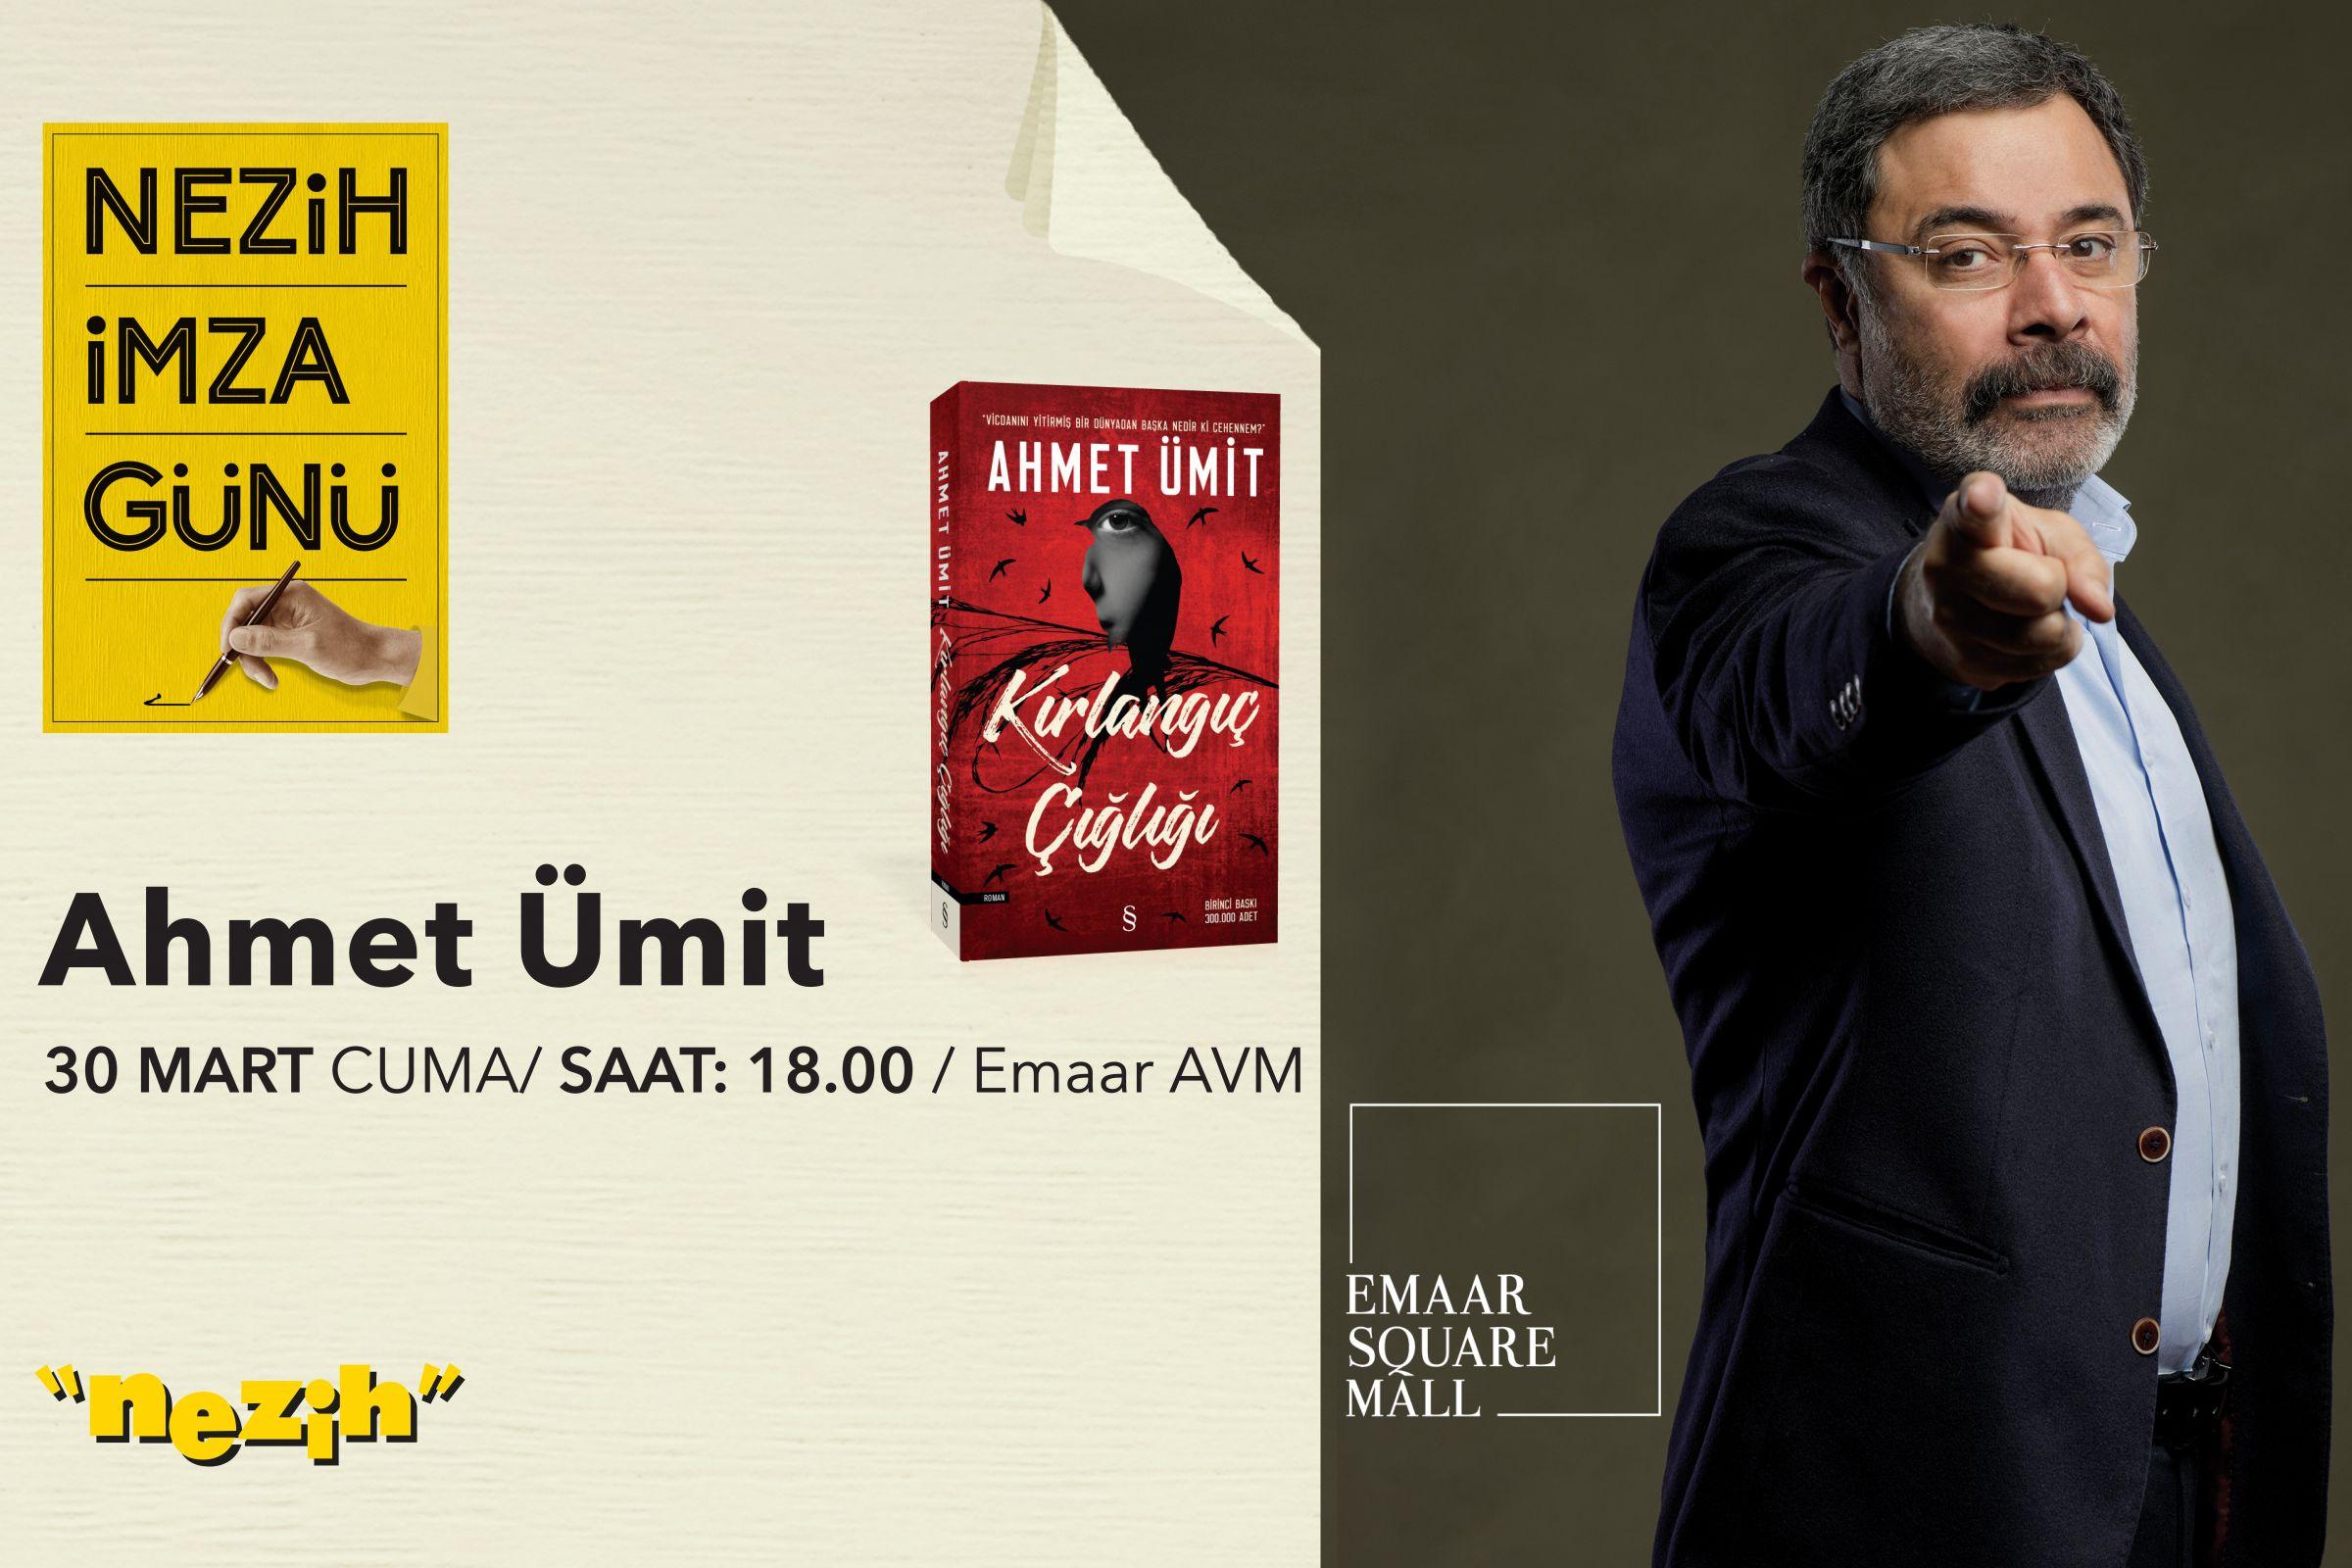 Ahmet Ümit - Nezih İmza Günü